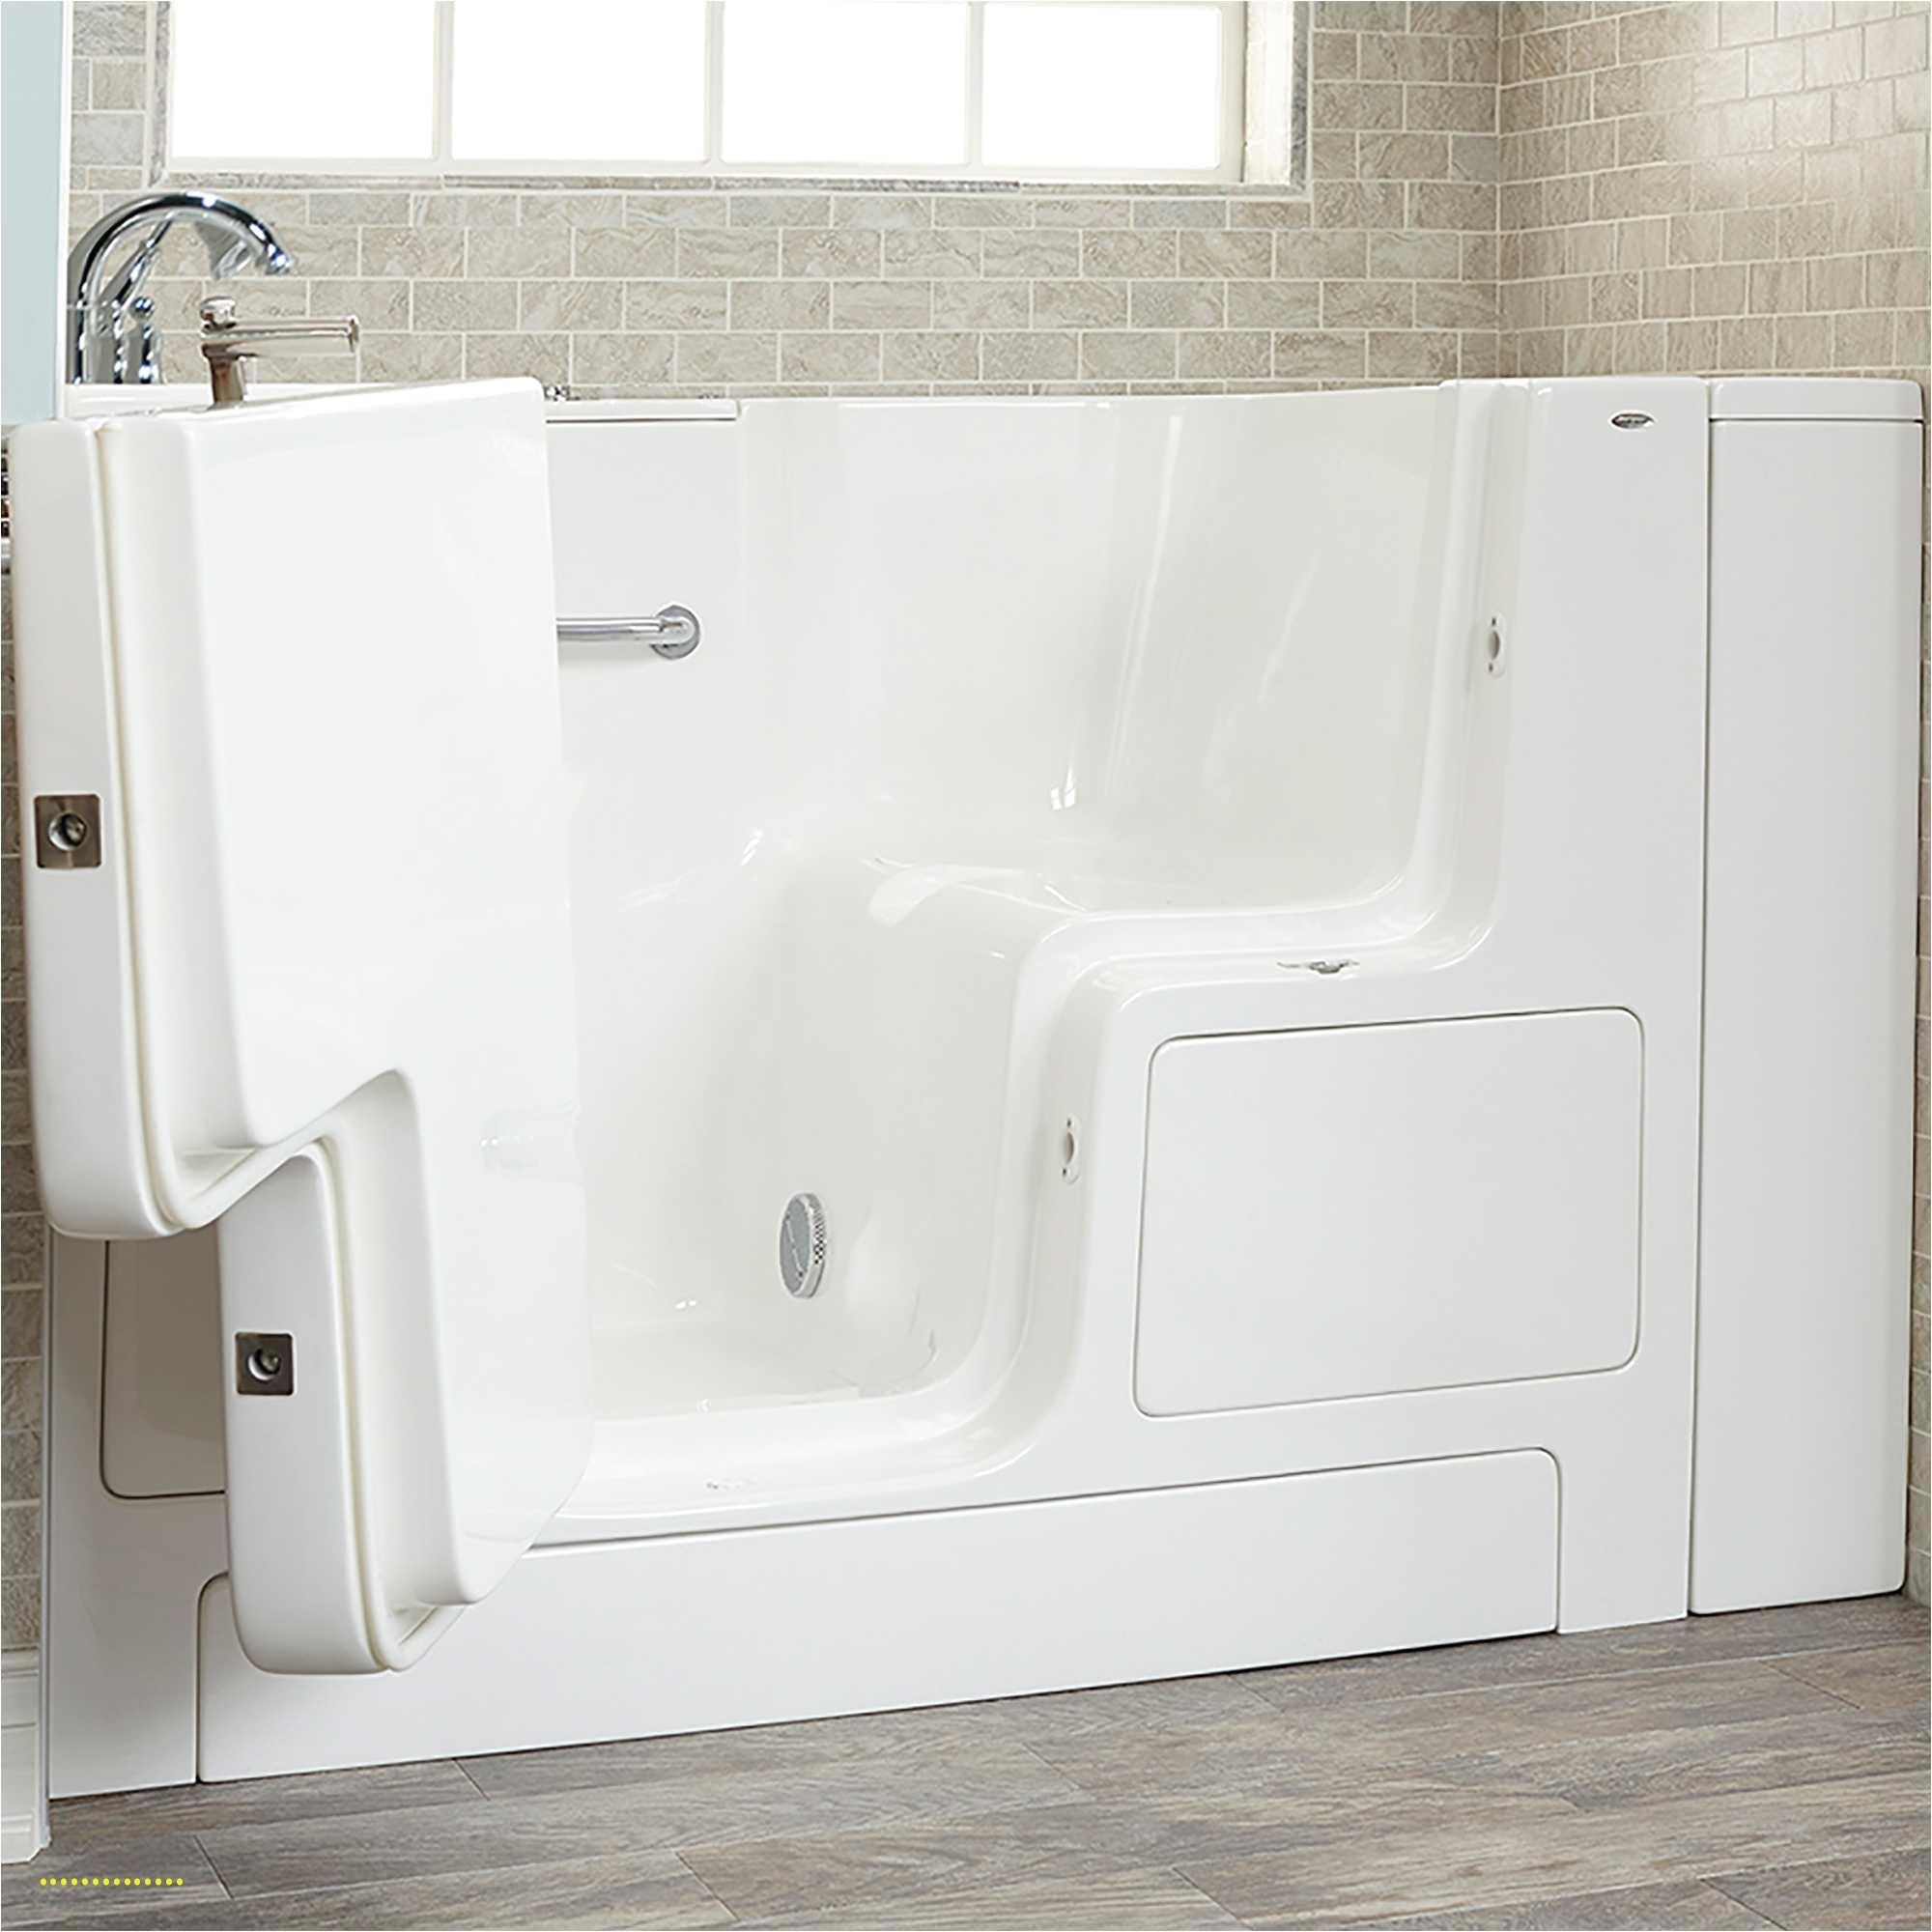 2 person soaking tub beautiful value series 32a—52 inch walk in tub